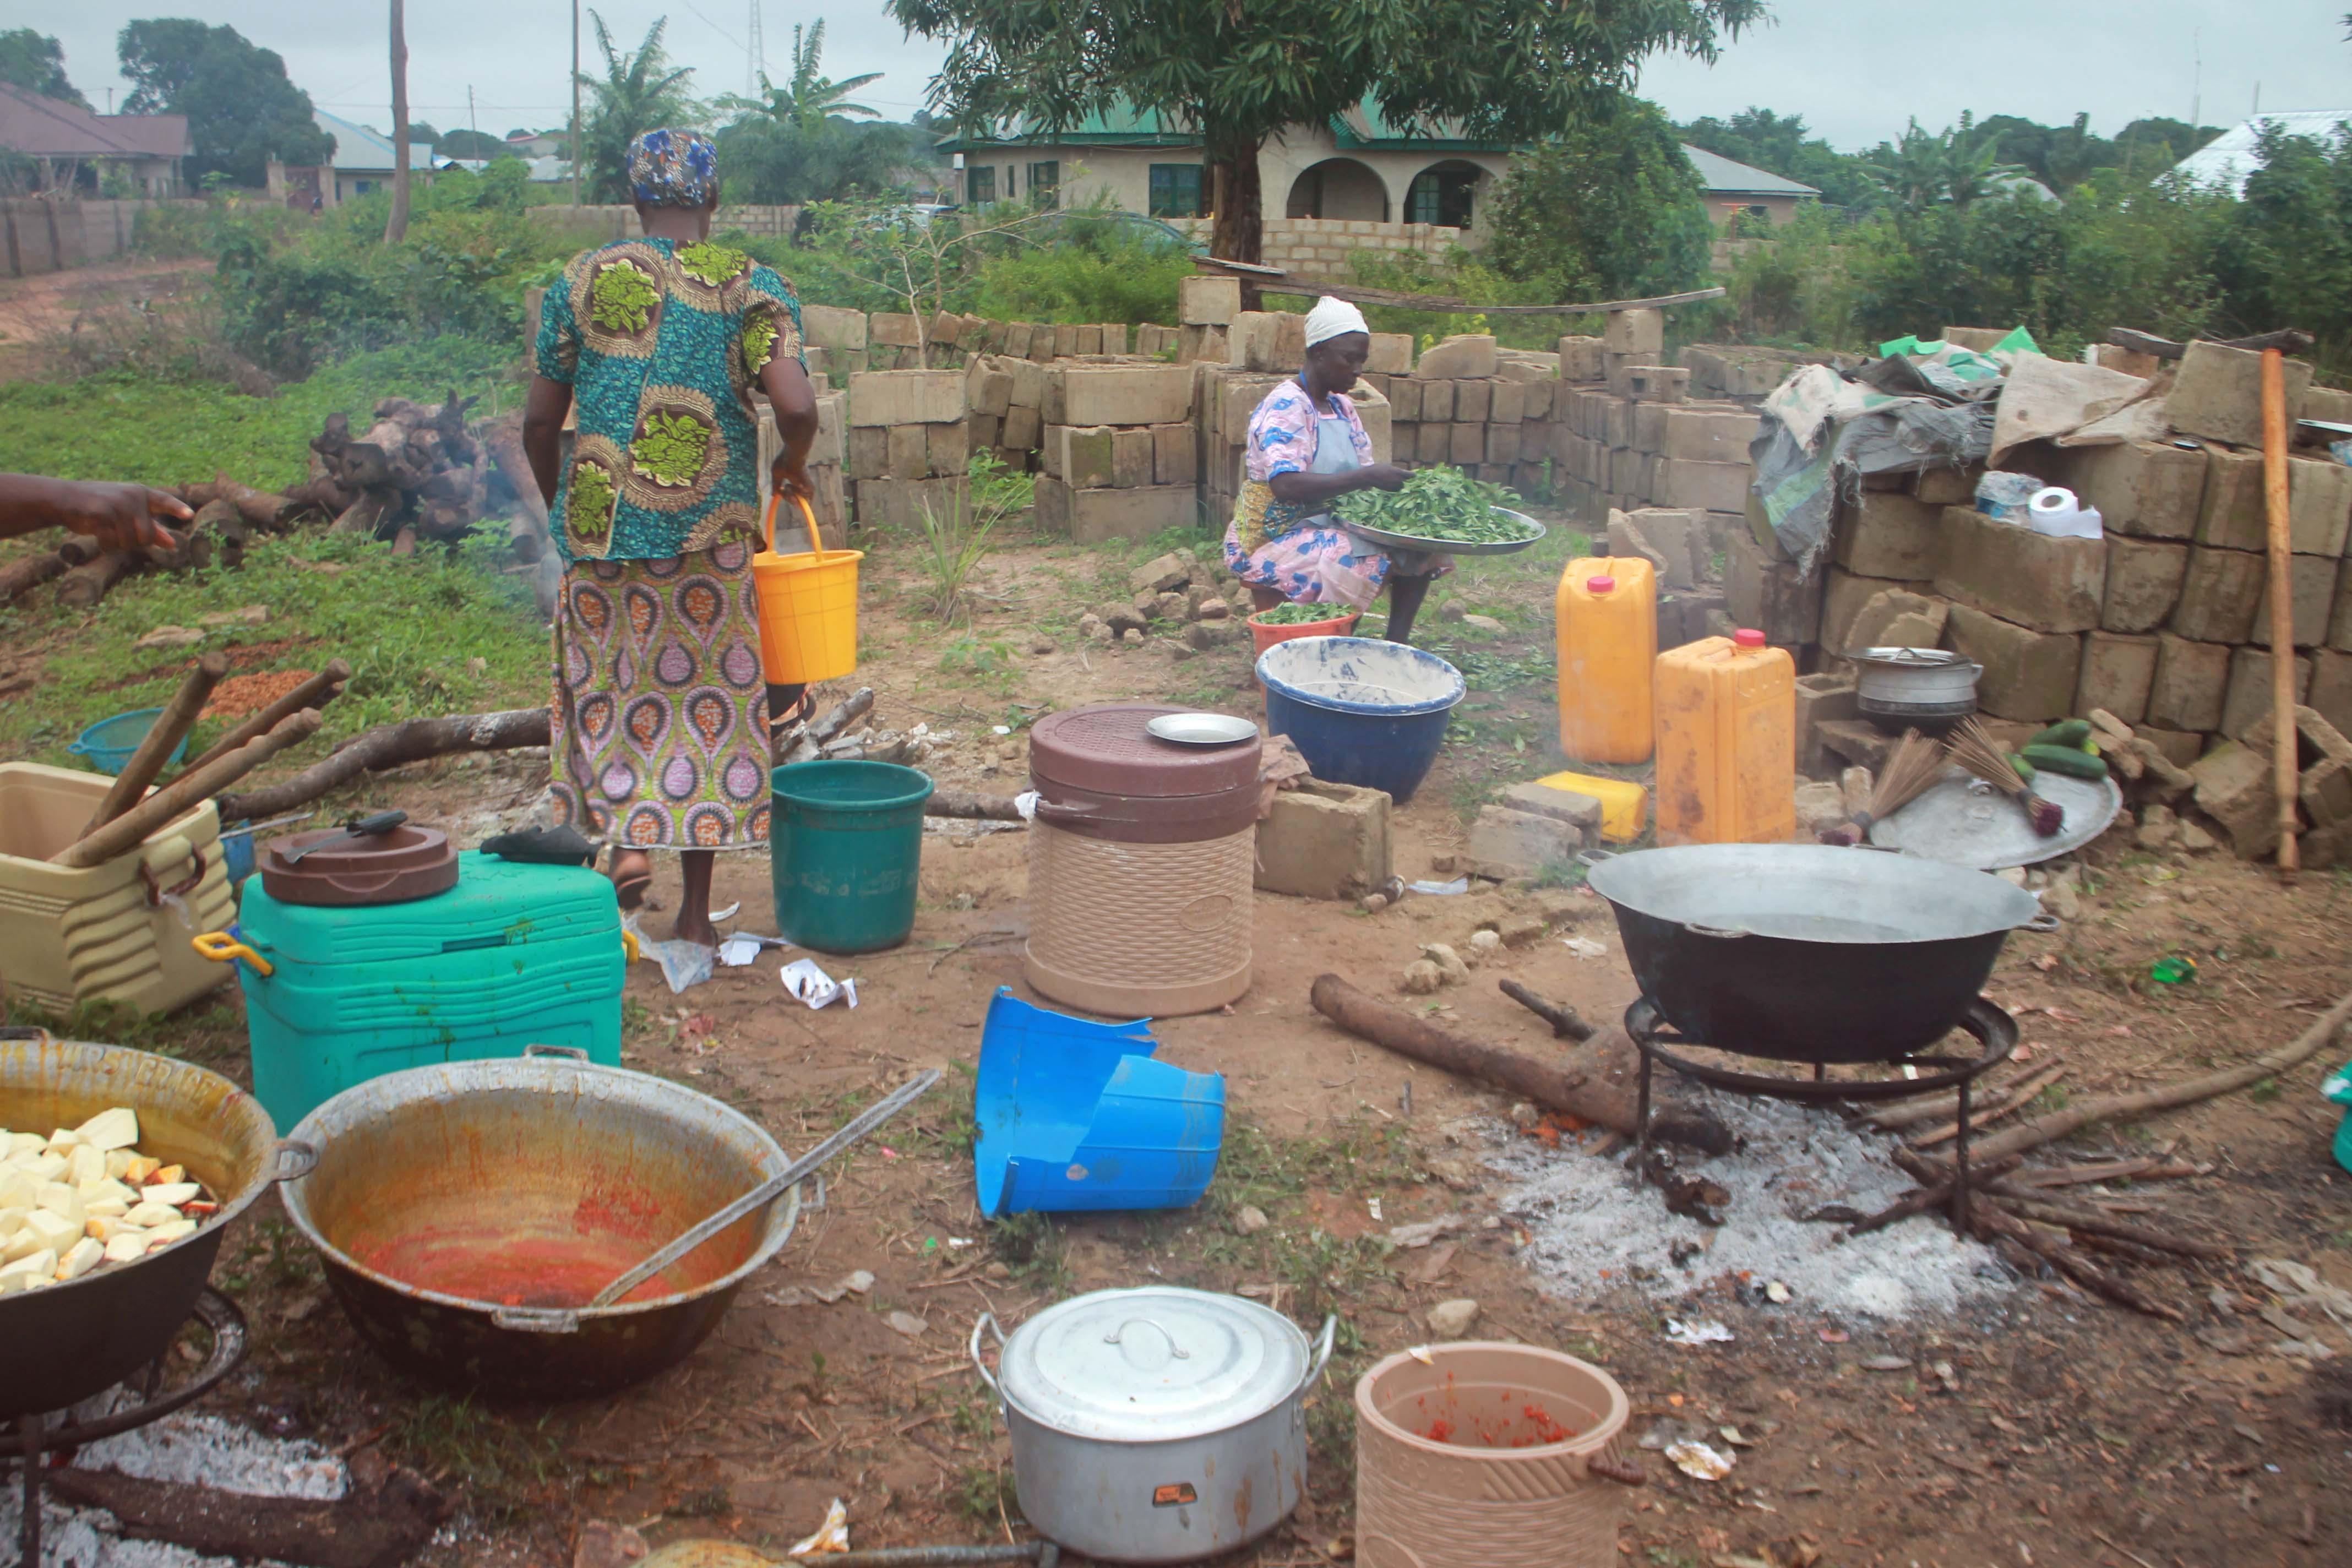 Backyard Camping Bandcamp : Iya Olonje (Food is Ready)  Ogbomosho Oyo State Nigeria  #JujuFilms